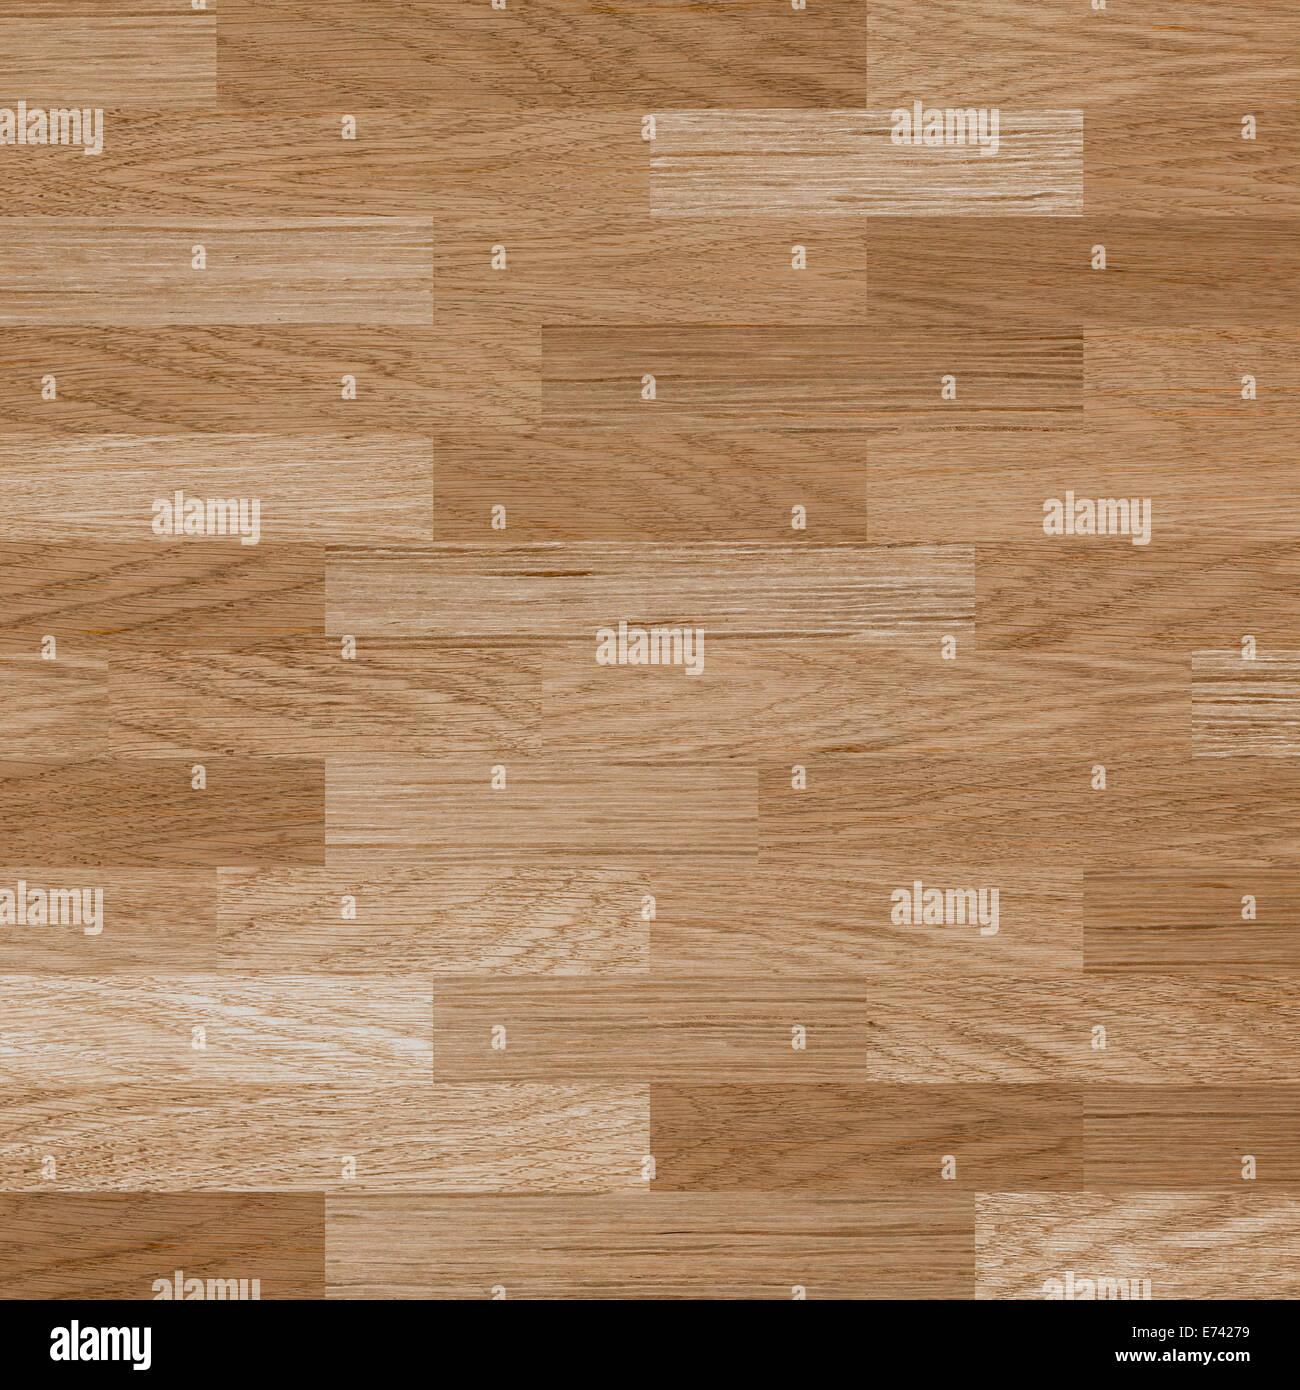 Parkett Laminat Holz Textur Hintergrund